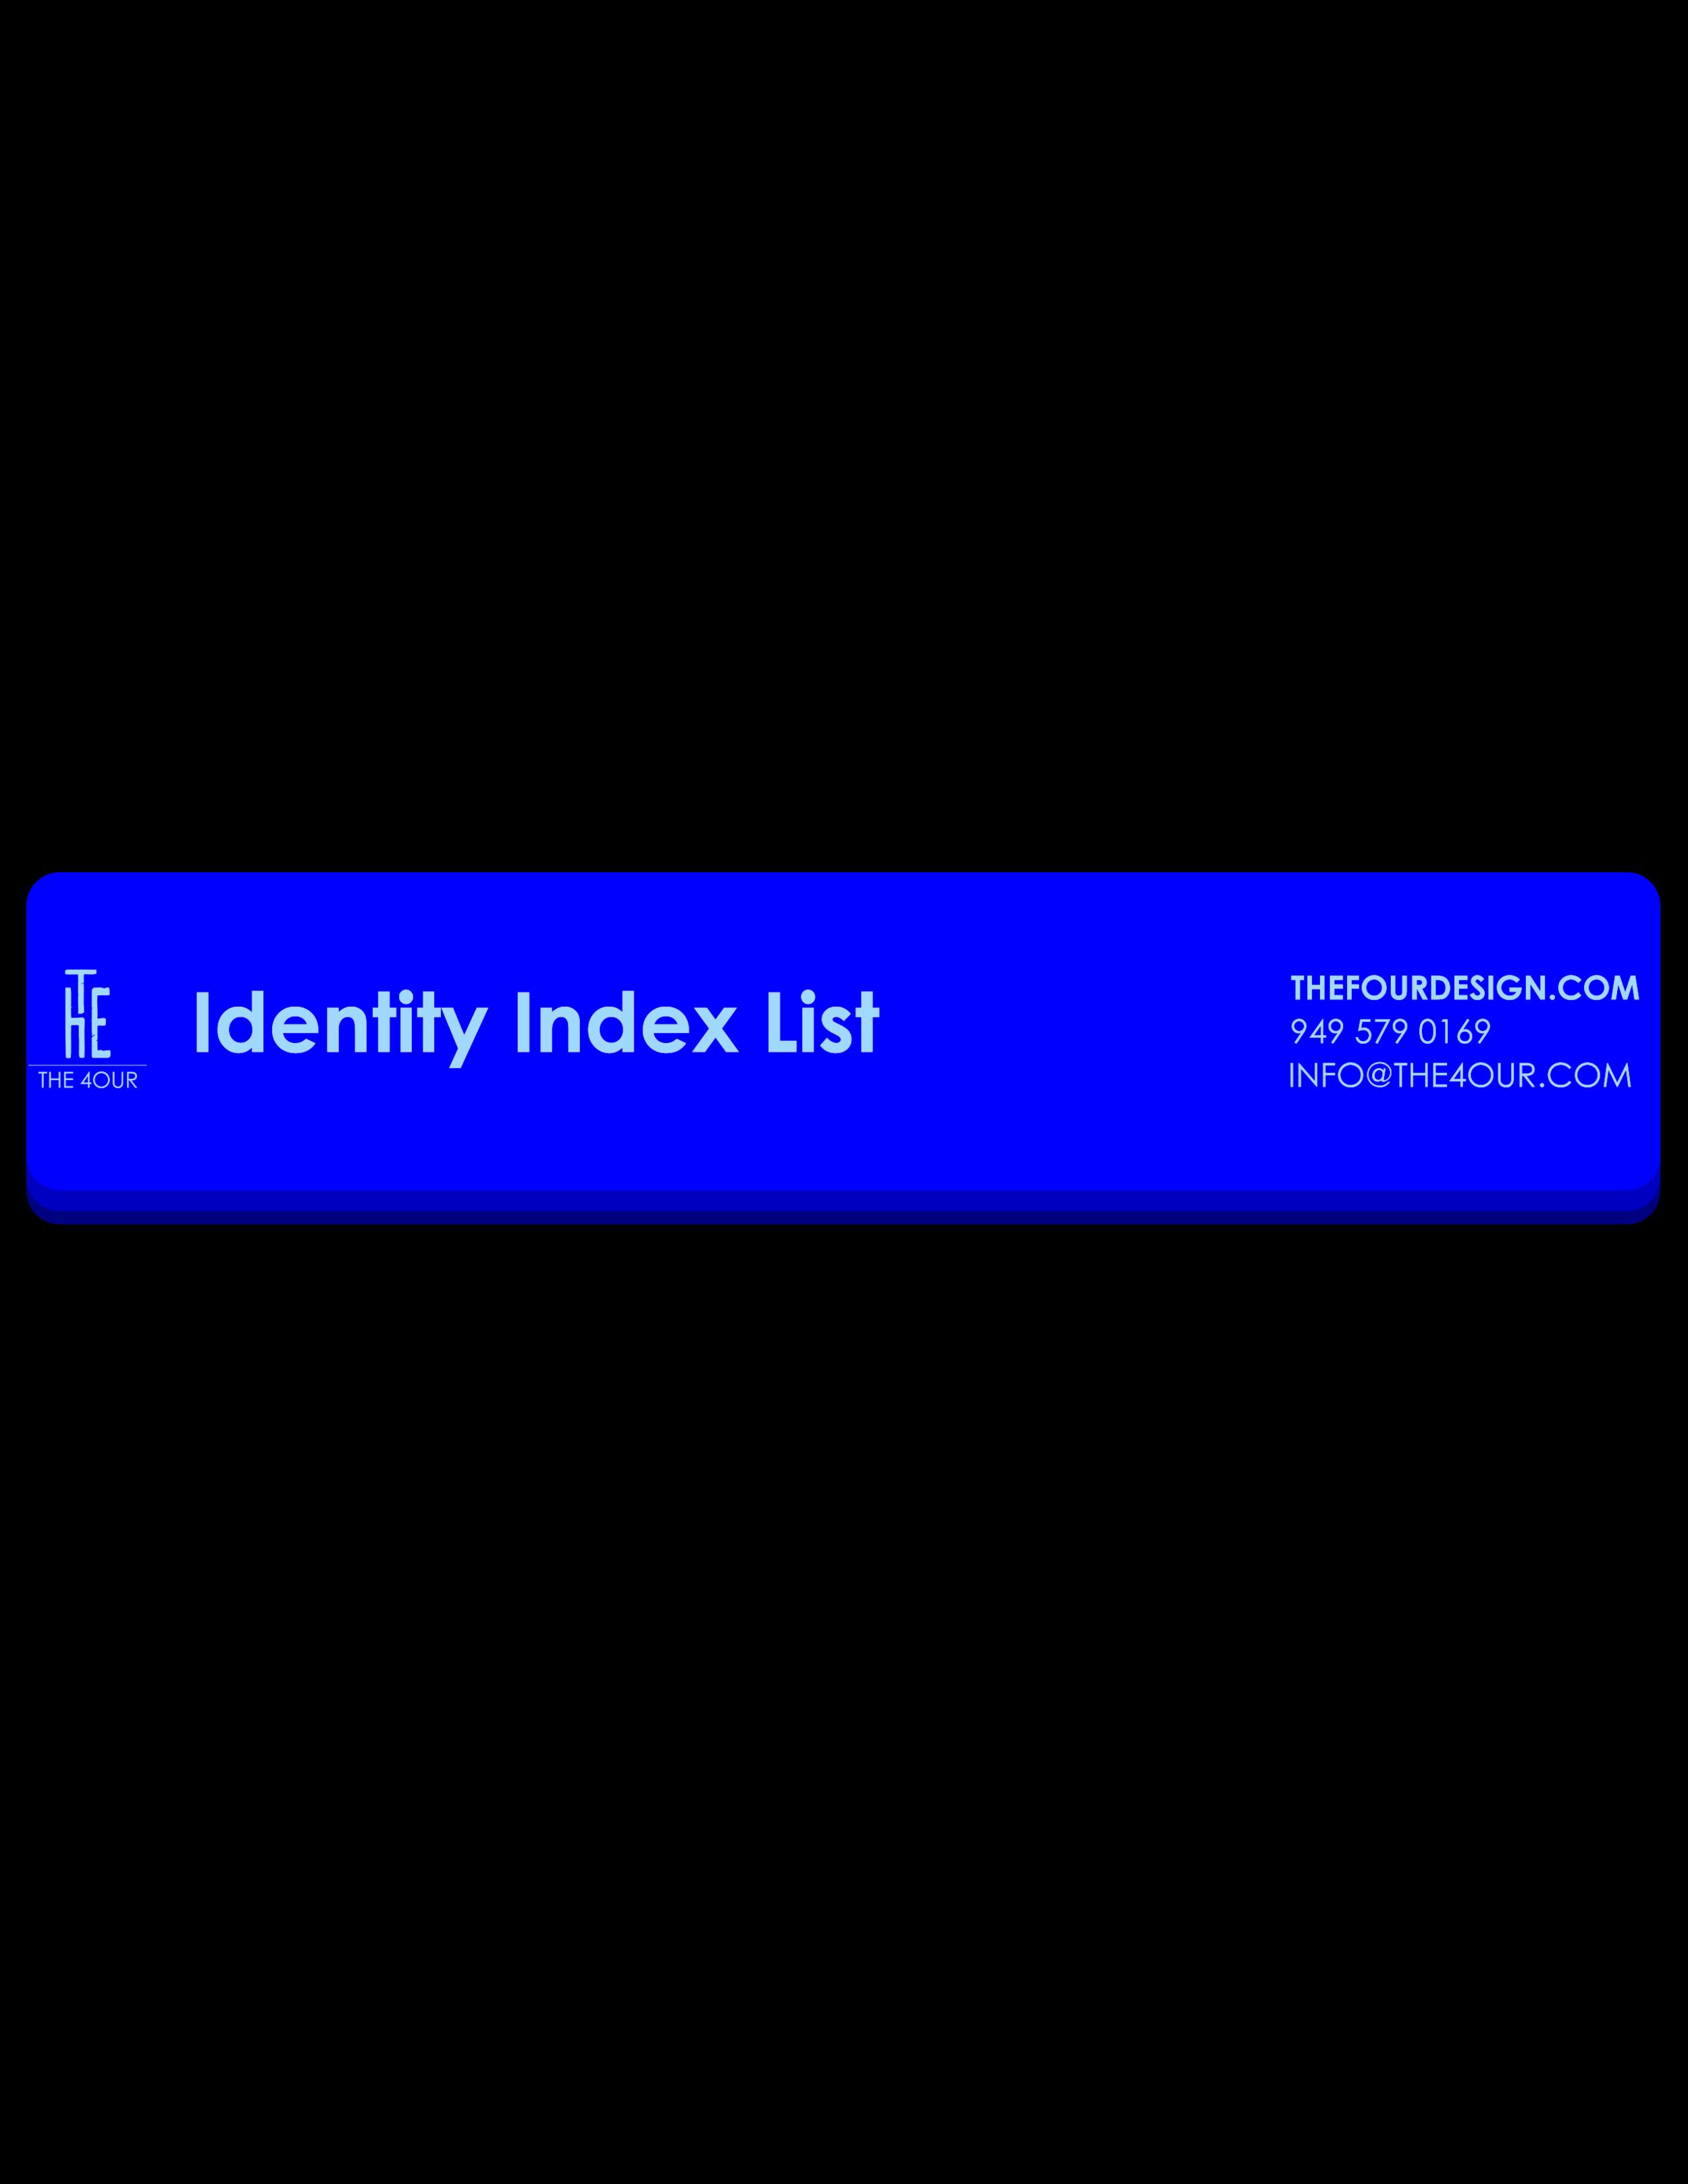 Identity Index List